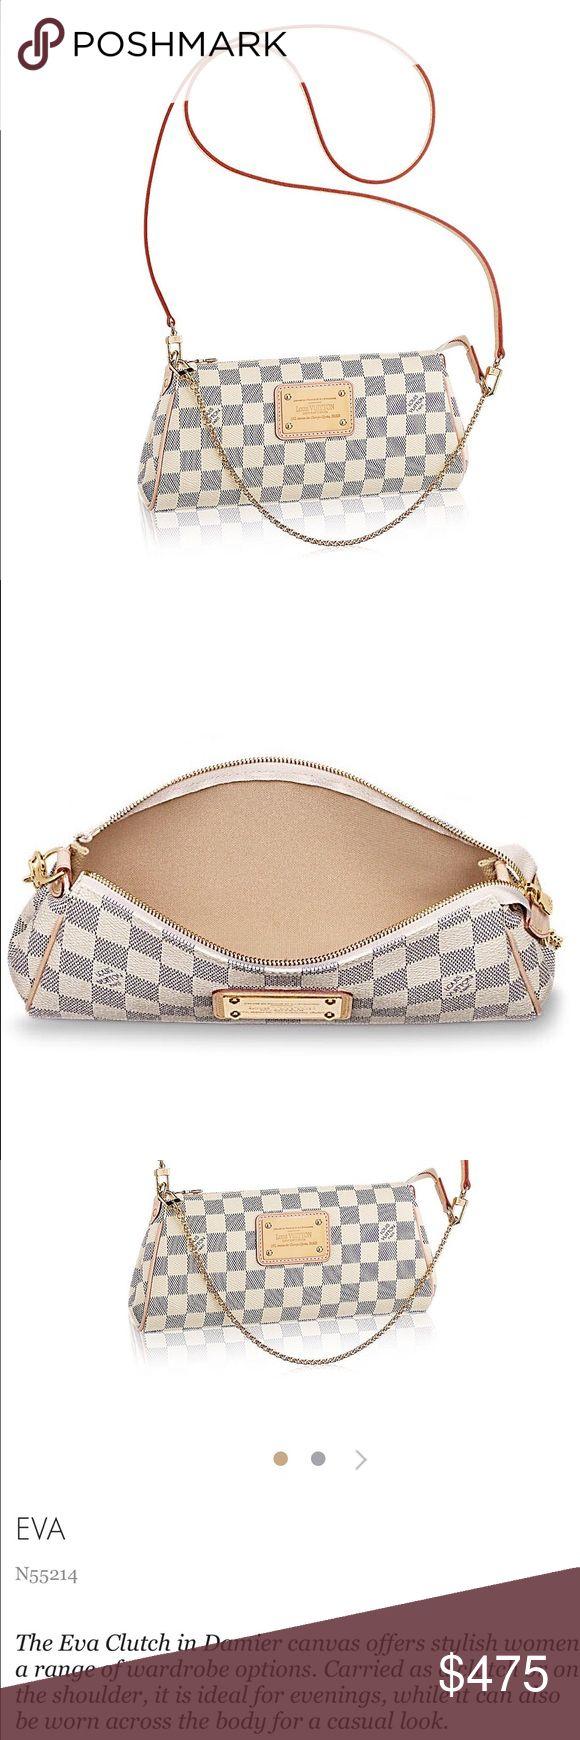 7b28b23c7b903 Gently Used Louis Vuitton Handbags For Sale